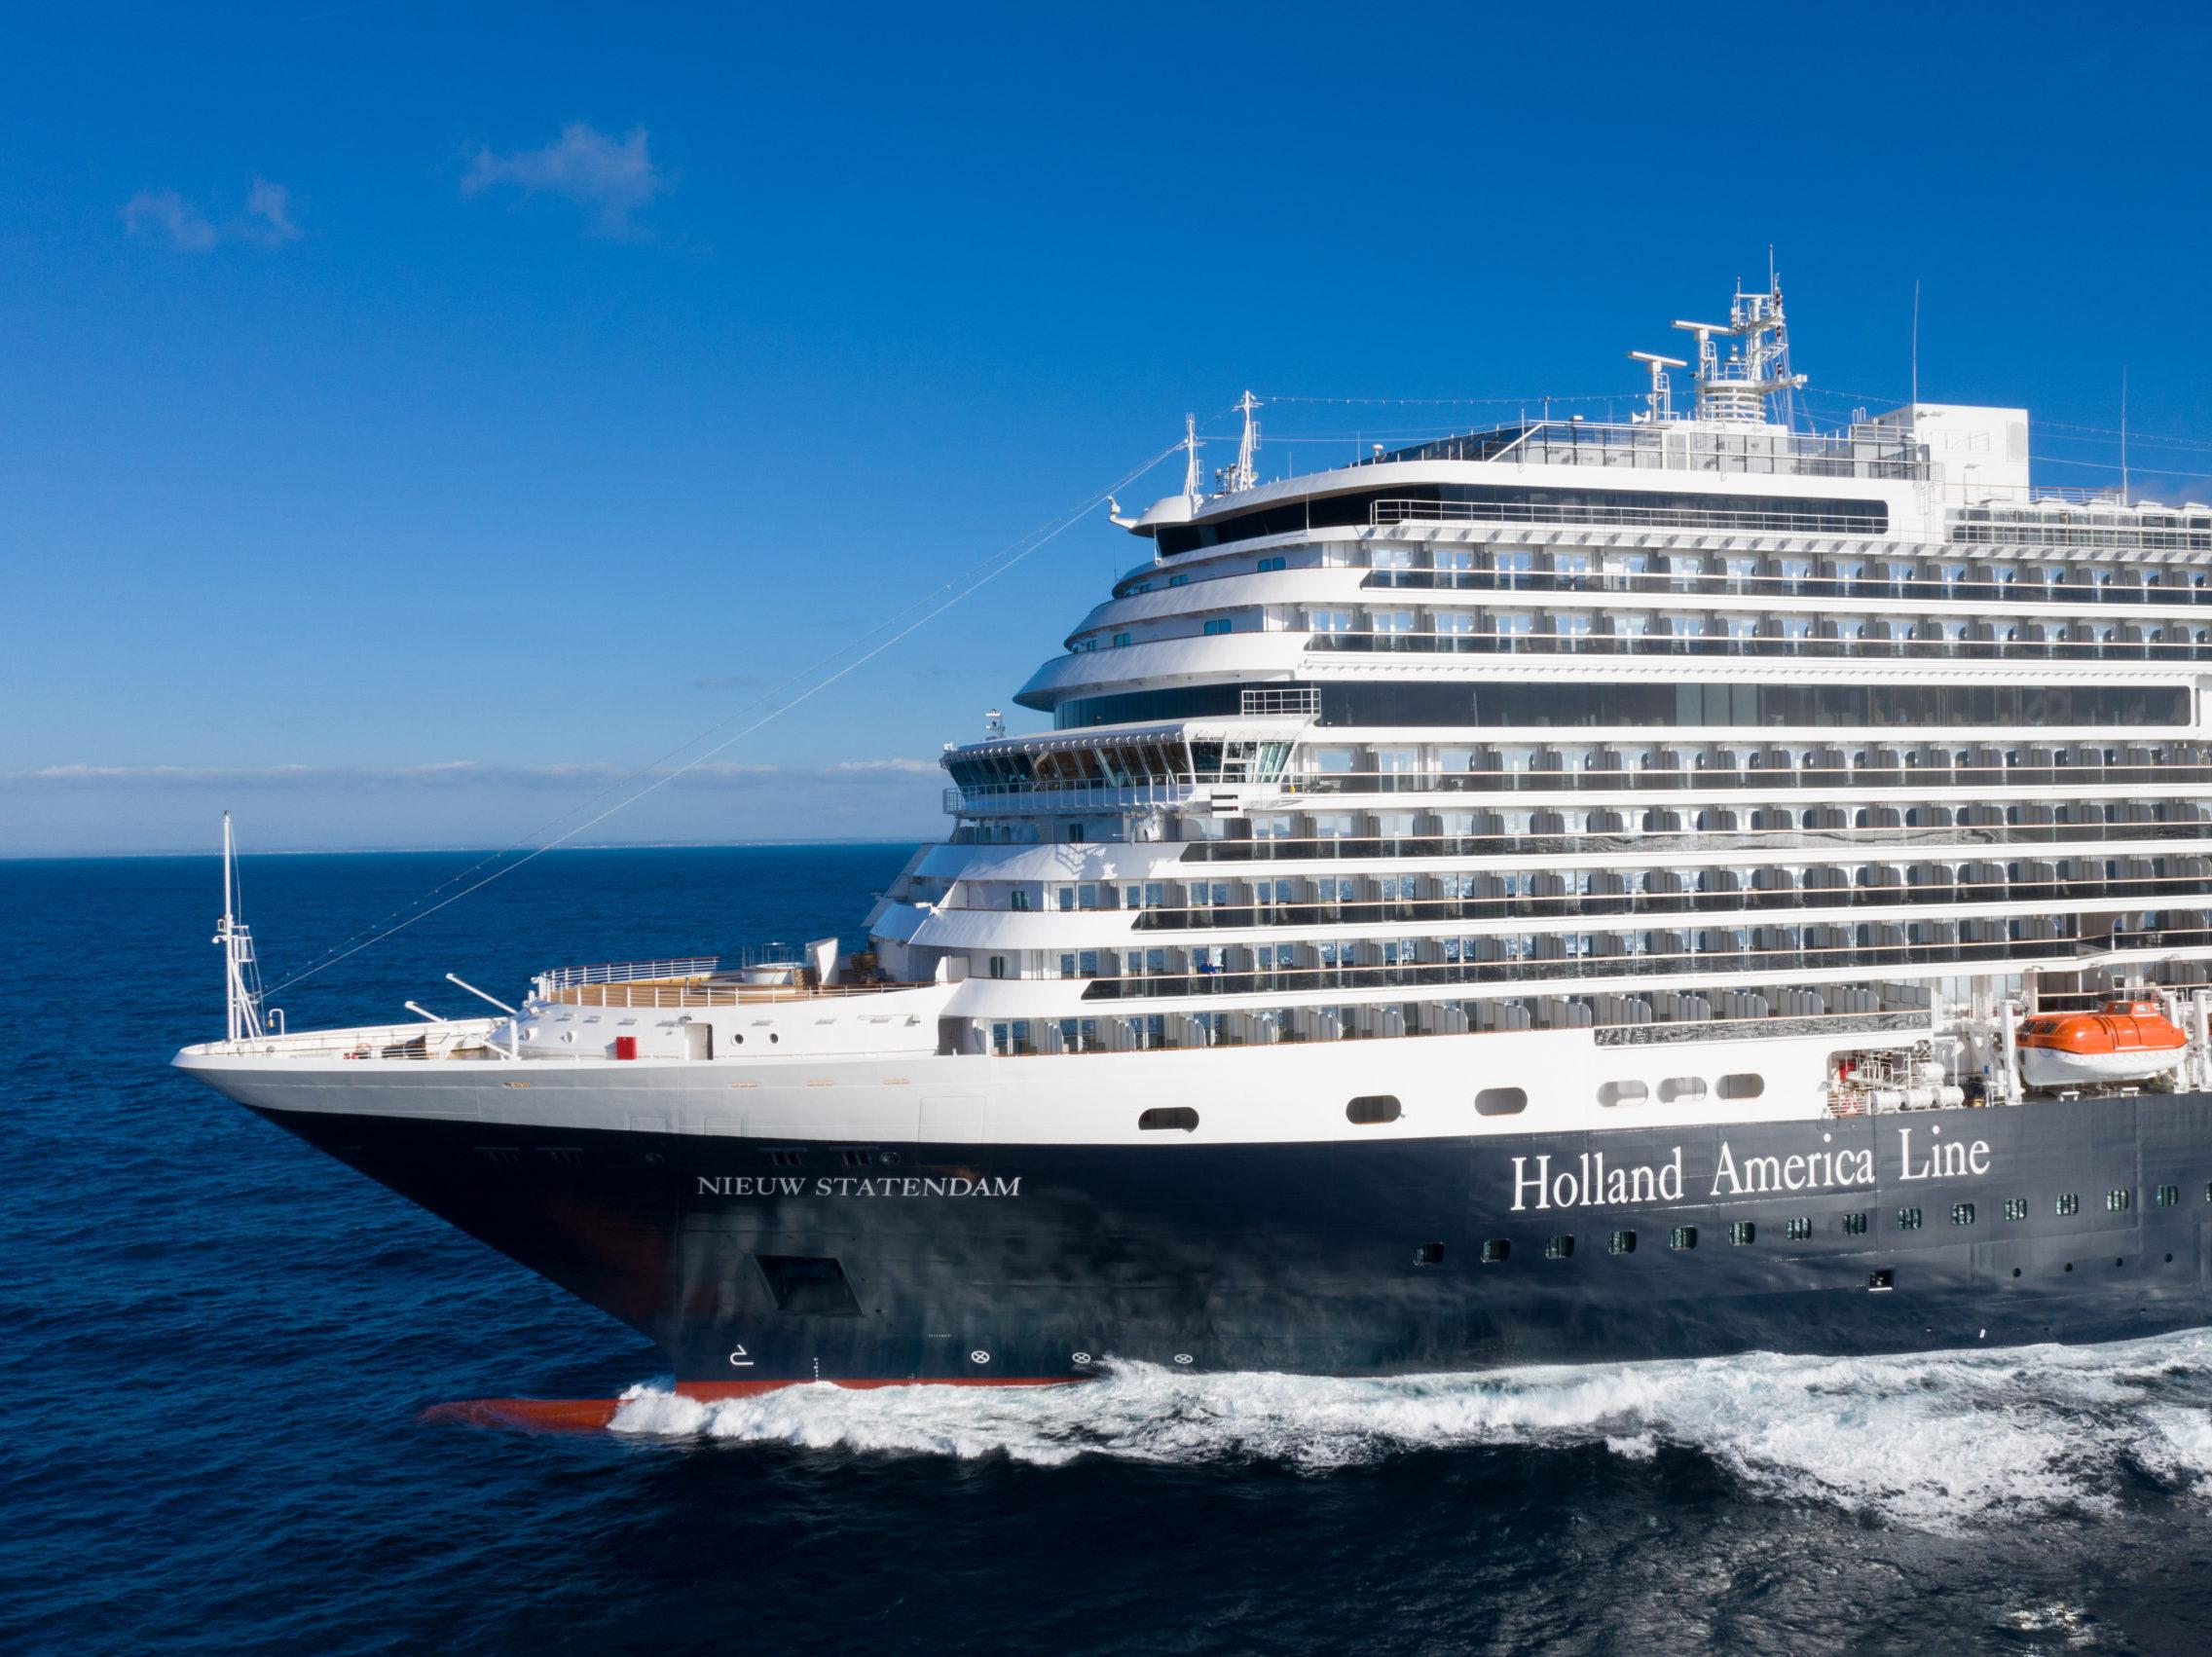 Nieuw Statendam-Schip-Cruisemarkt.eu